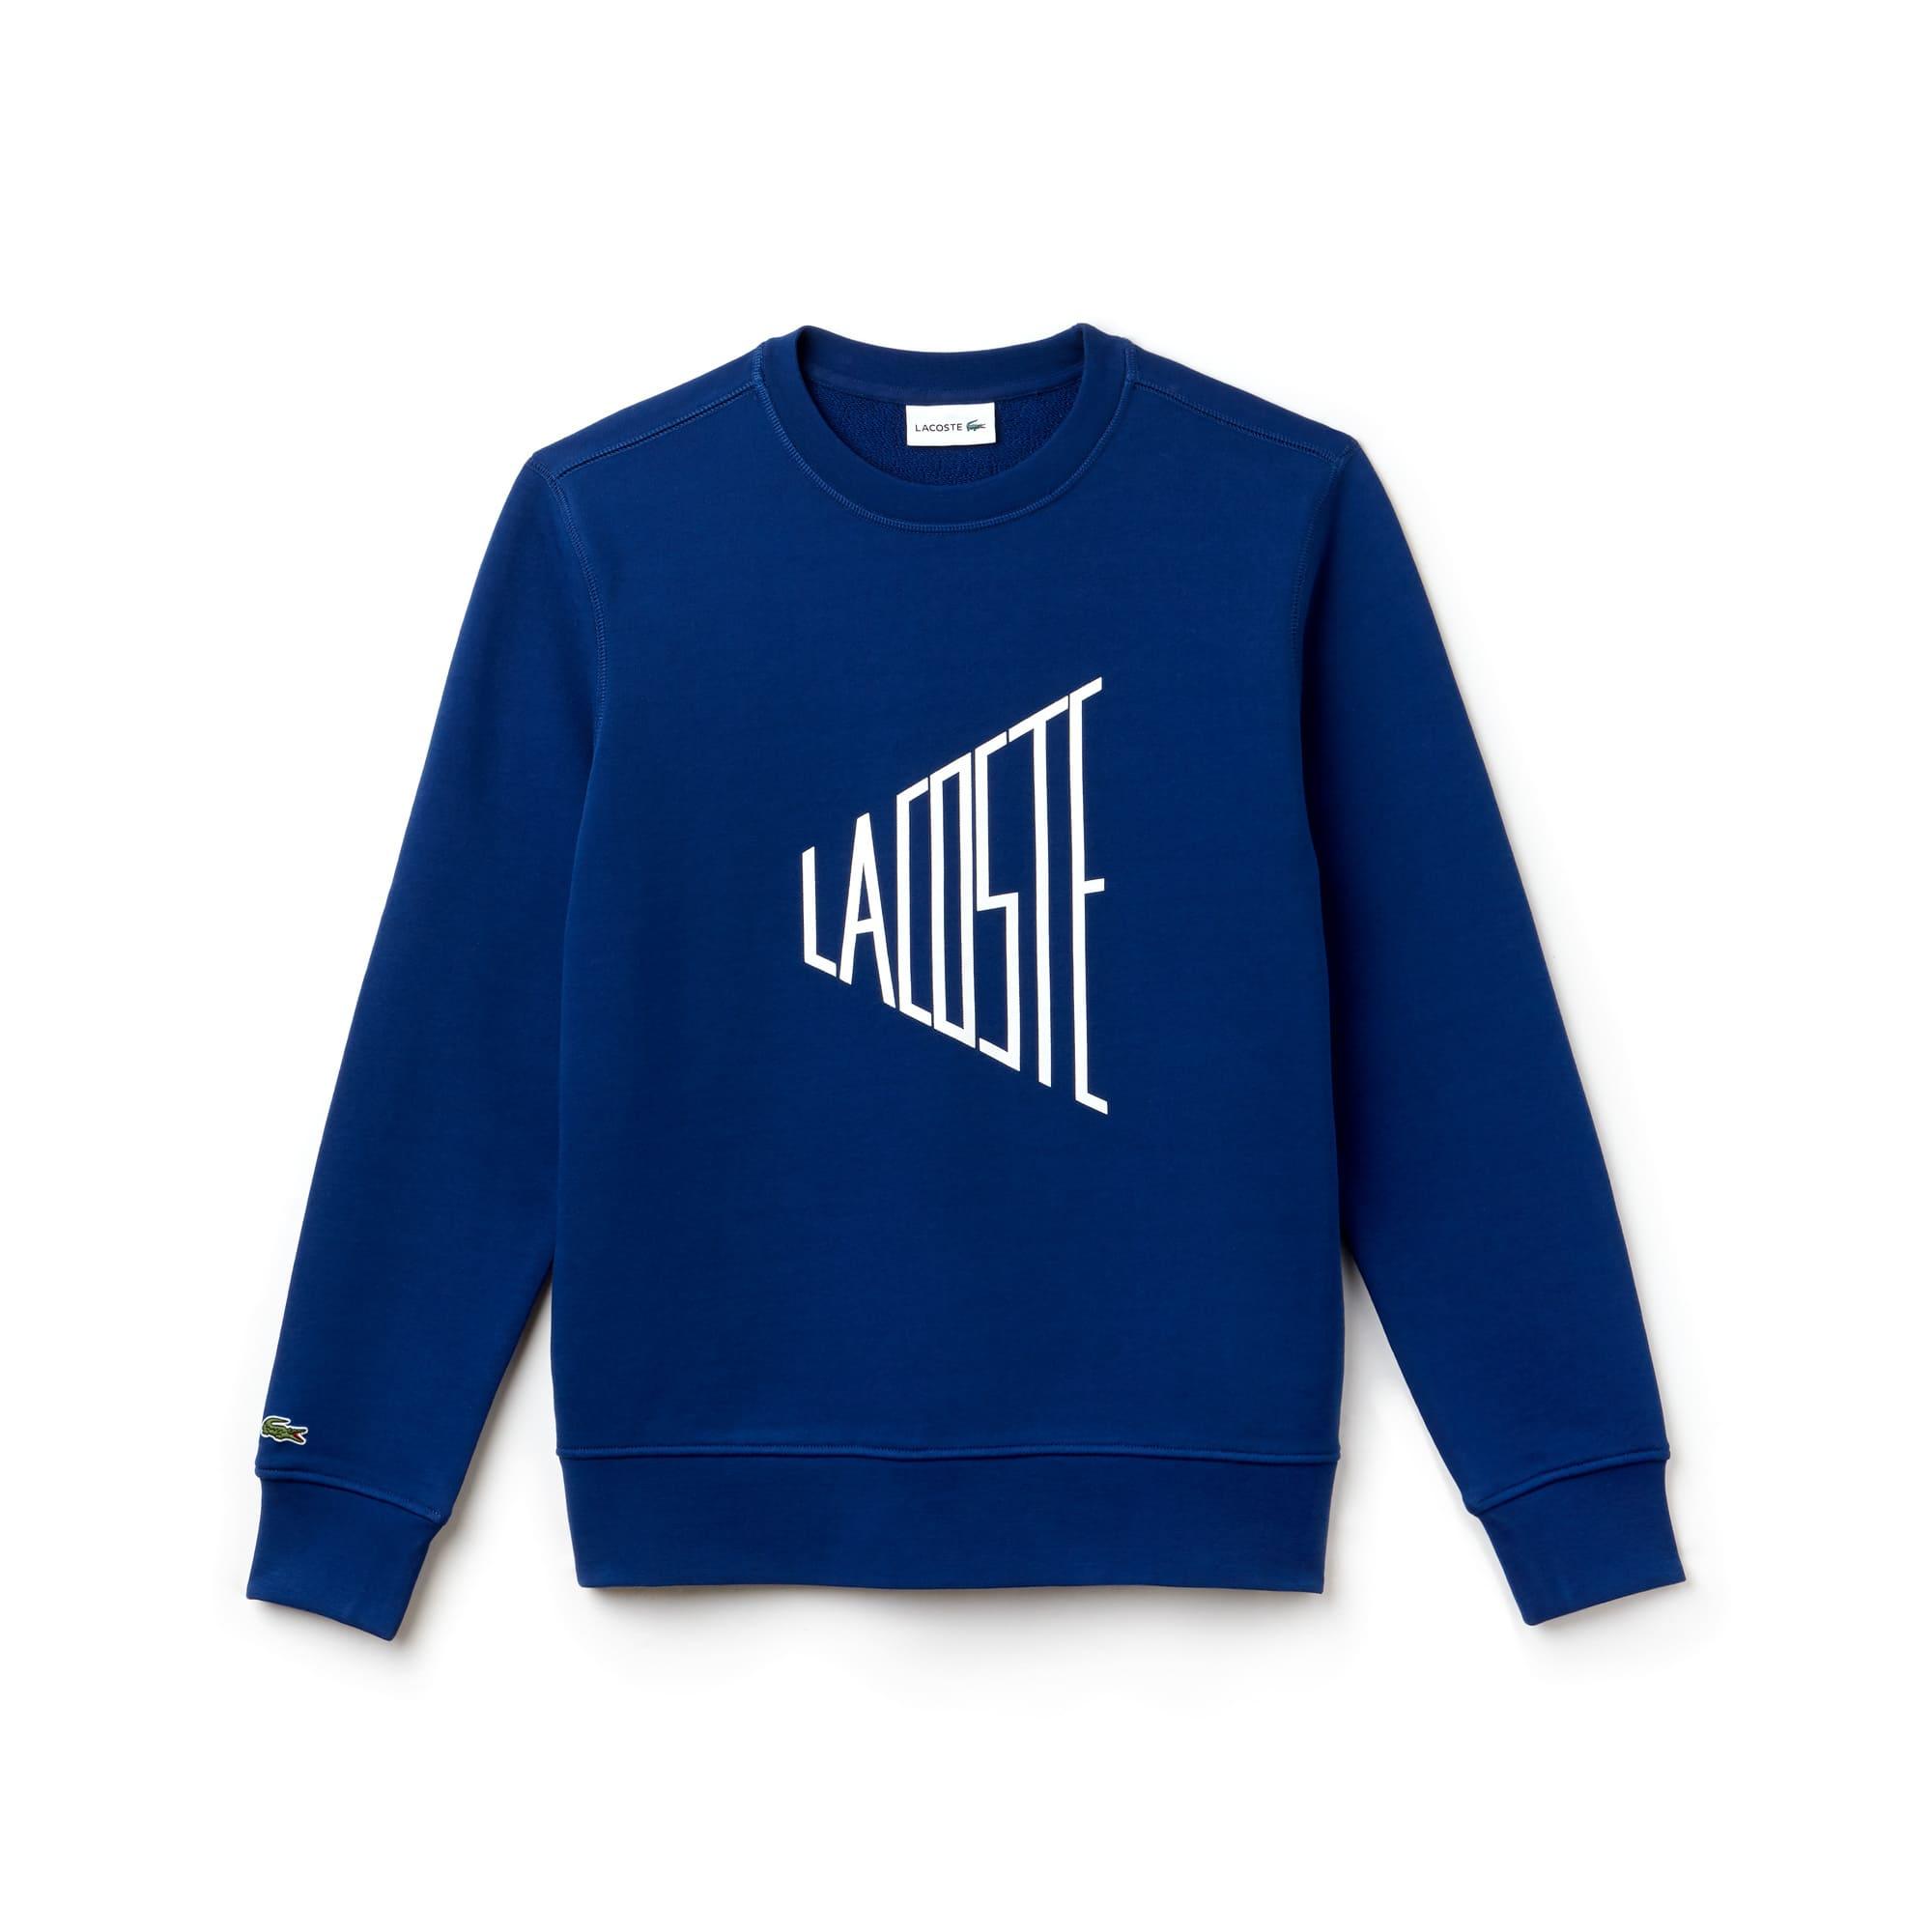 Herren-Rundhals-Sweatshirt aus Fleece mit LACOSTE-Schriftzug